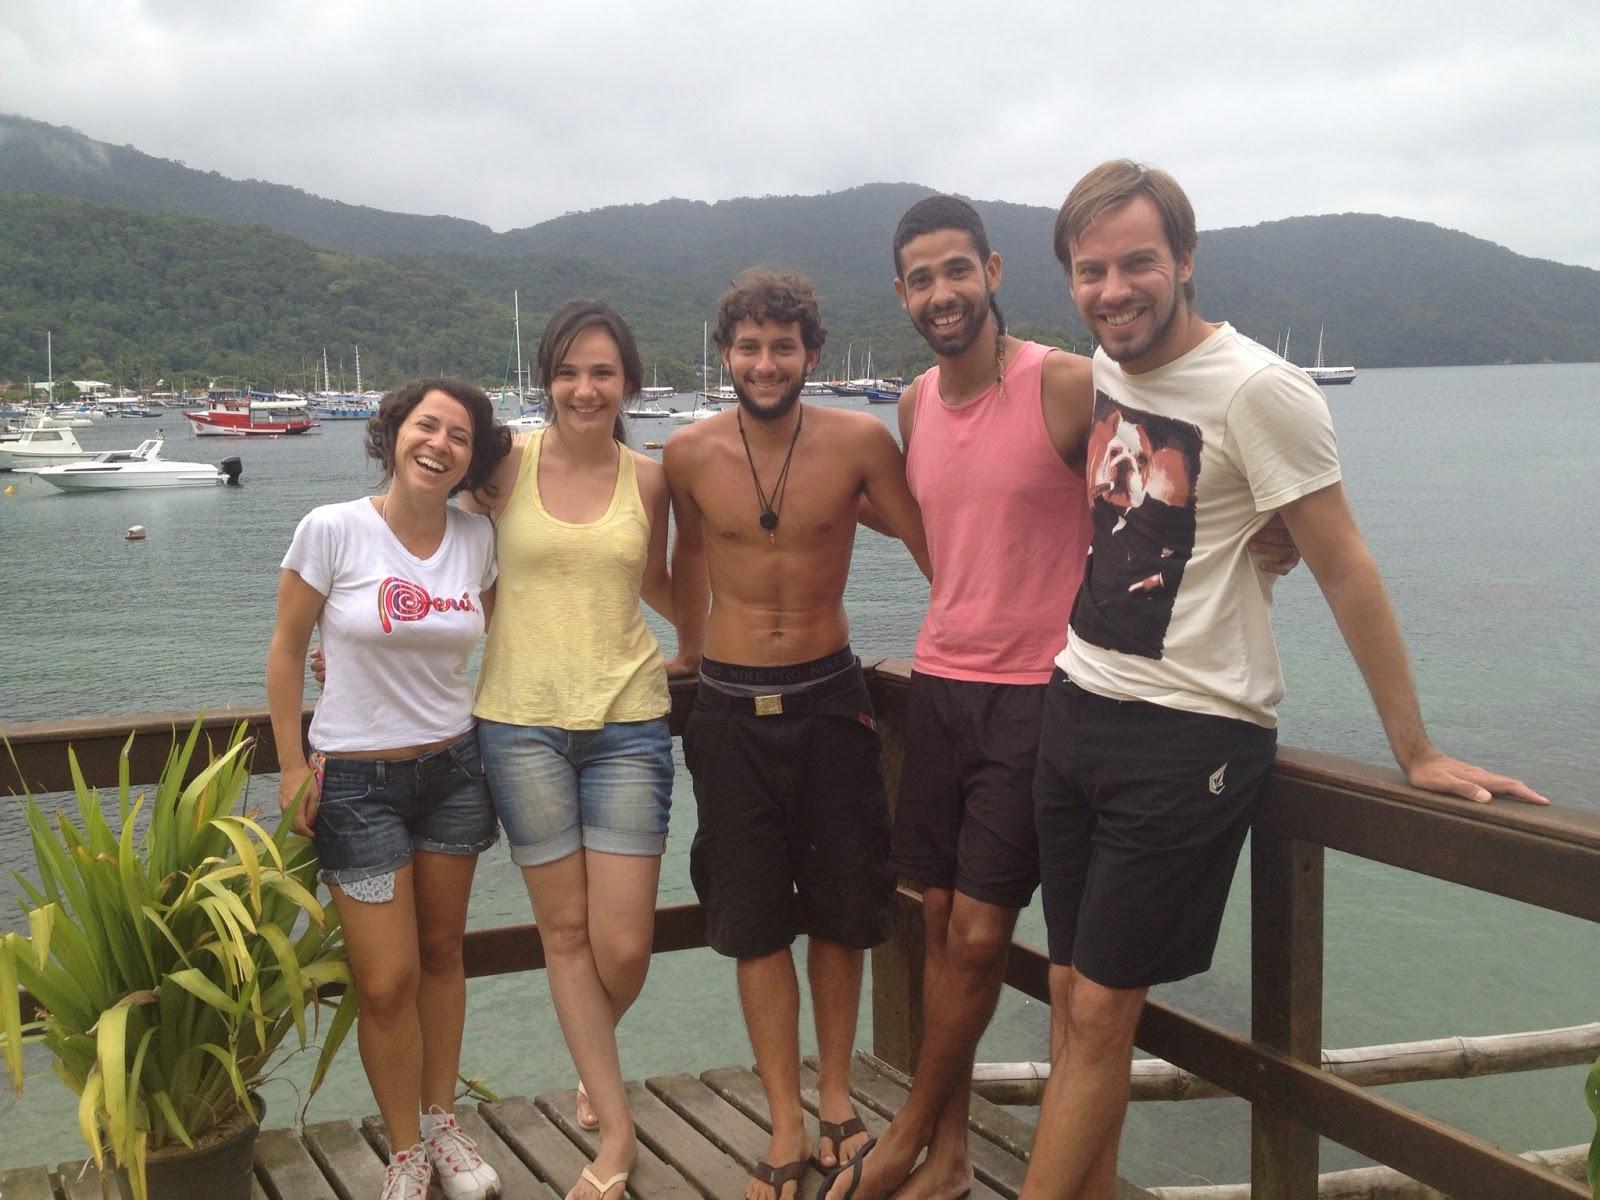 Team Brazil, France and England on the stunning island of Ilhe Grande